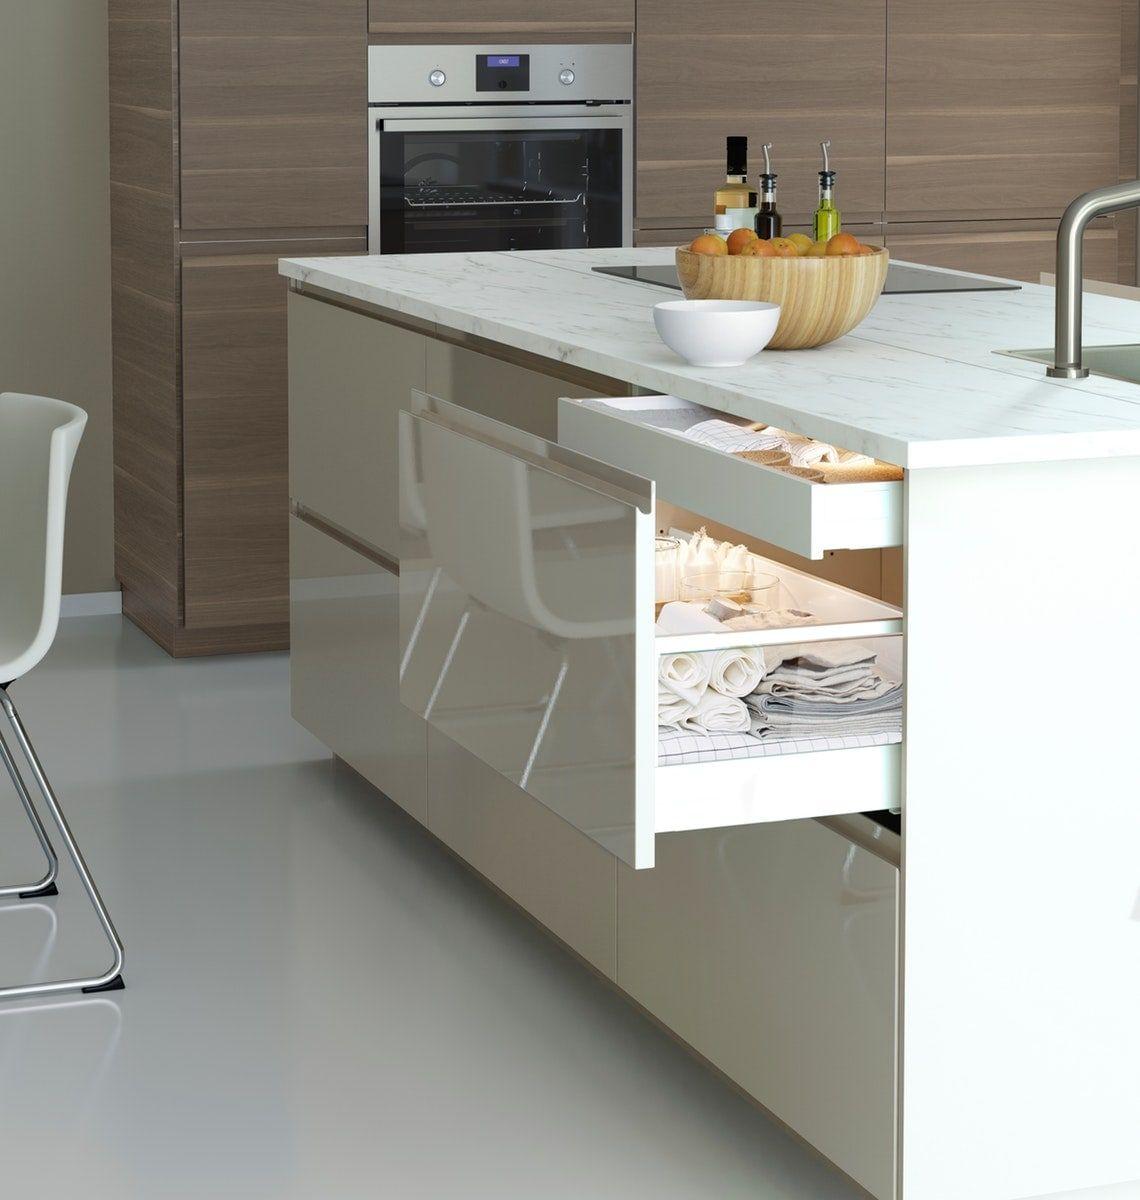 Page Finitions Cuisine Voxtorp Beige Brillant Cuisine Ikea Tiroir Cuisine Ikea